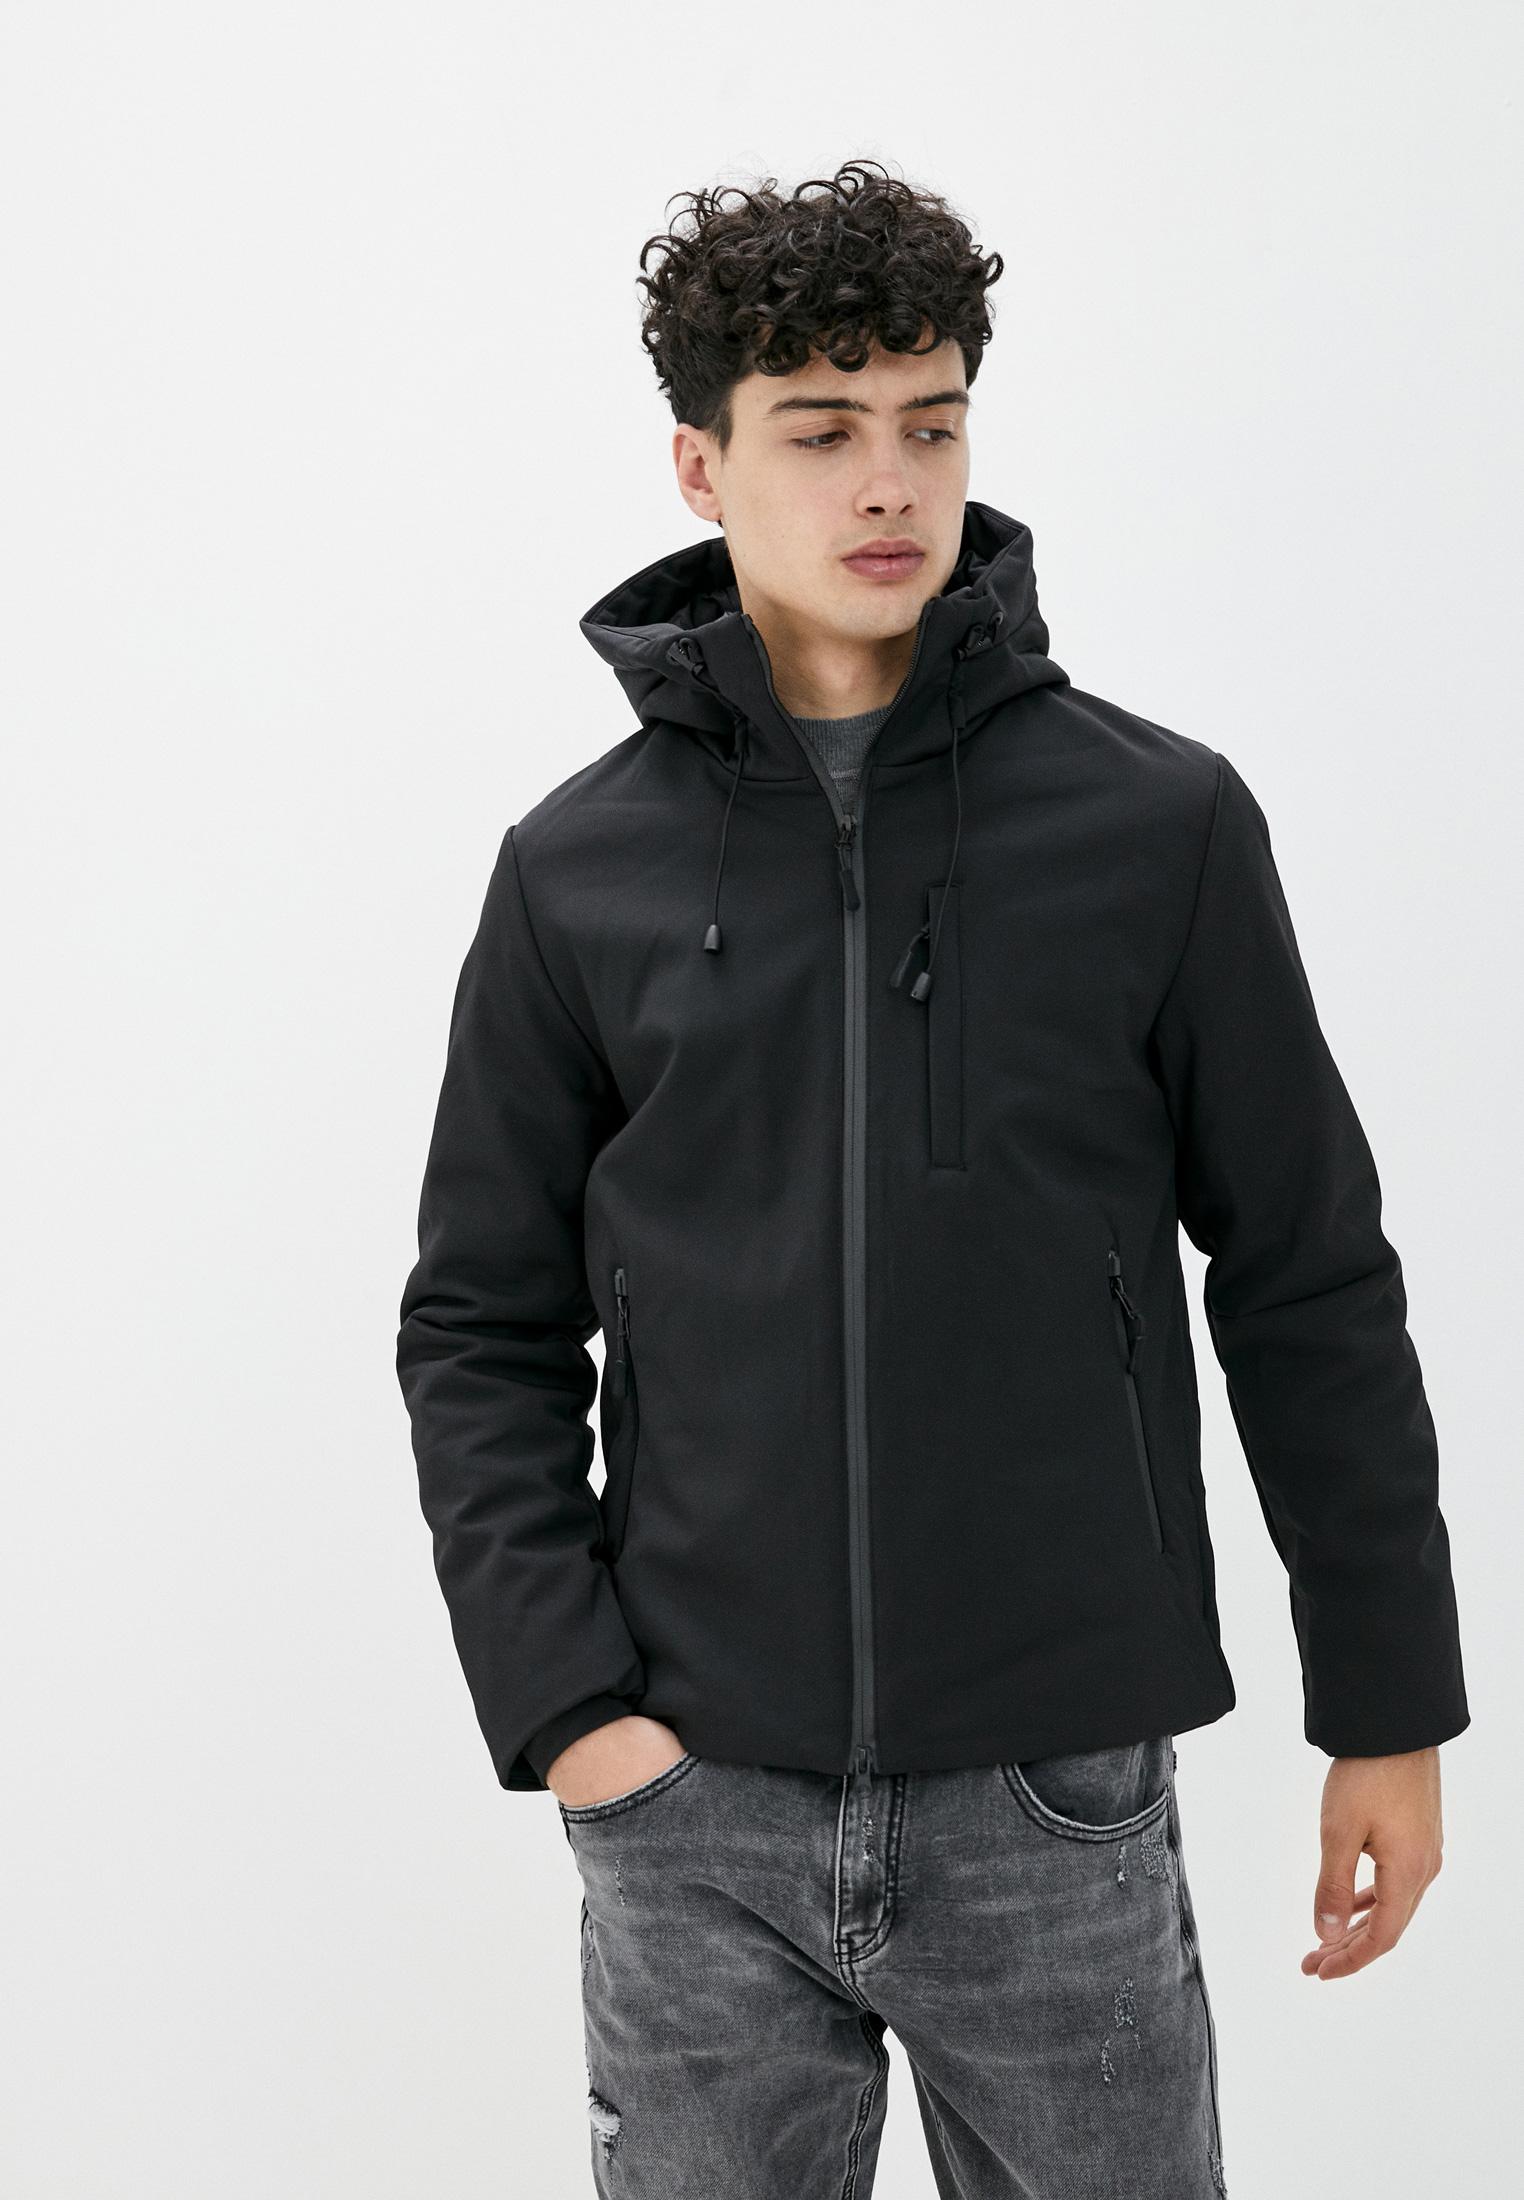 Утепленная куртка Tony Backer (Тони Беккер) Куртка утепленная Tony Backer